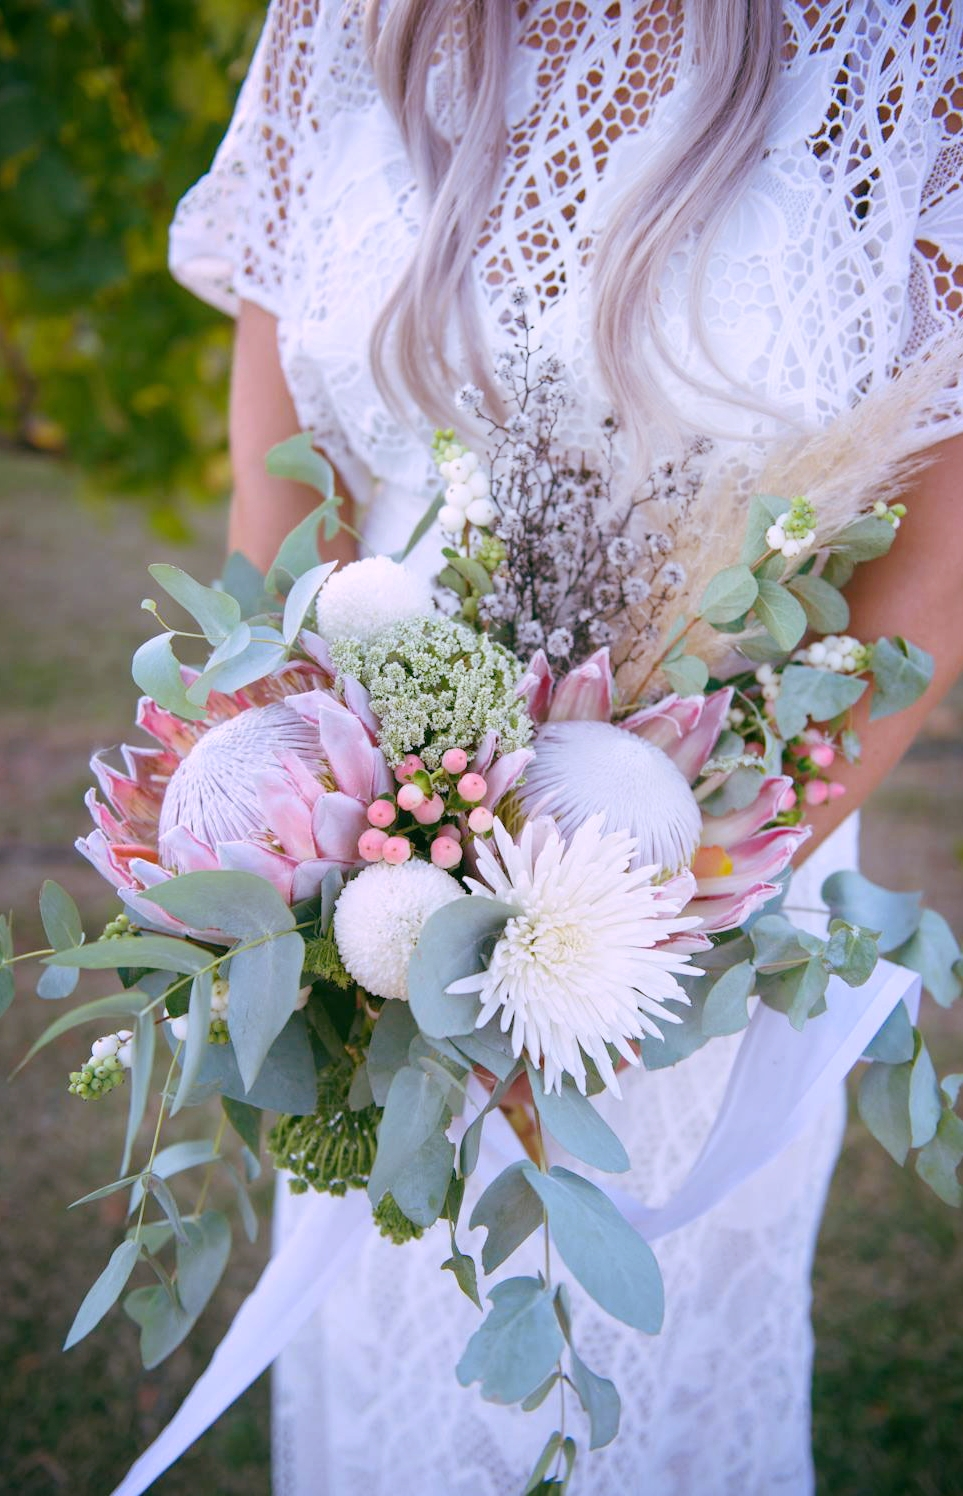 Nicoles-bouquet-pro-1.jpg